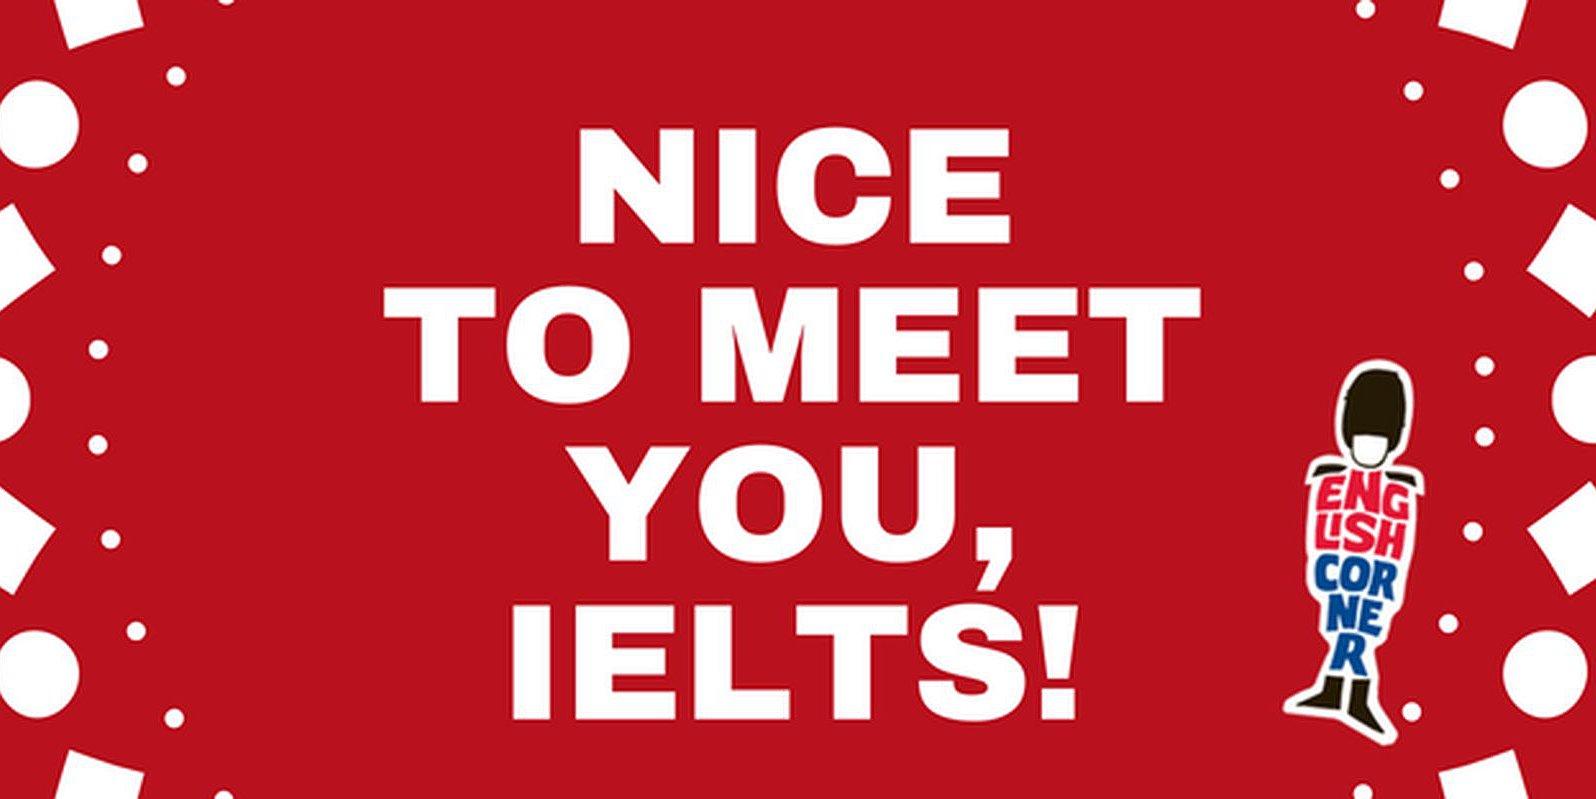 NICE TO MEET YOU, IELTS!